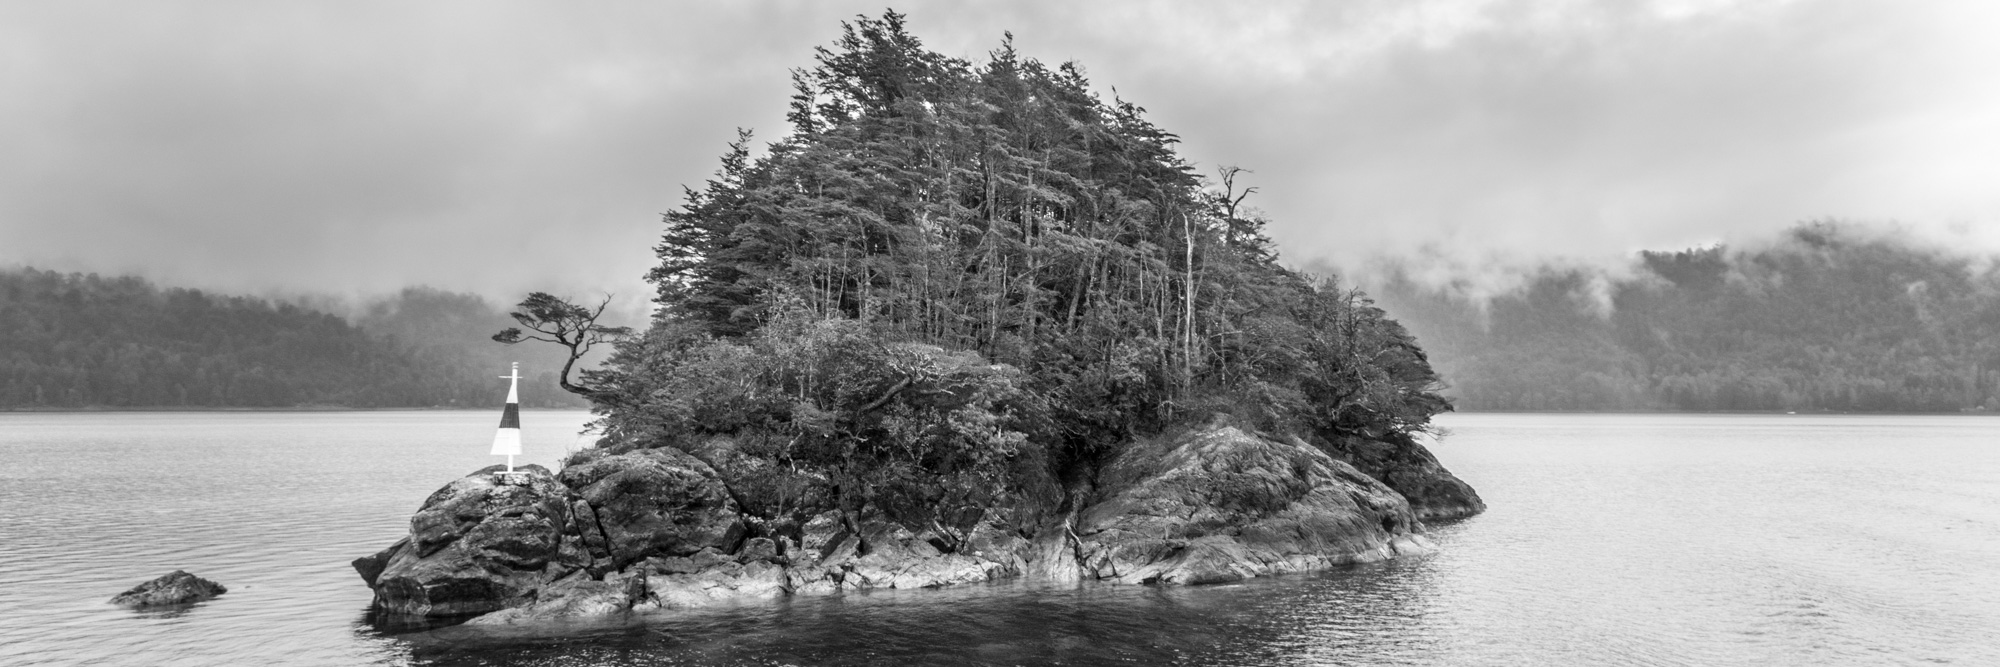 Photograph: Island